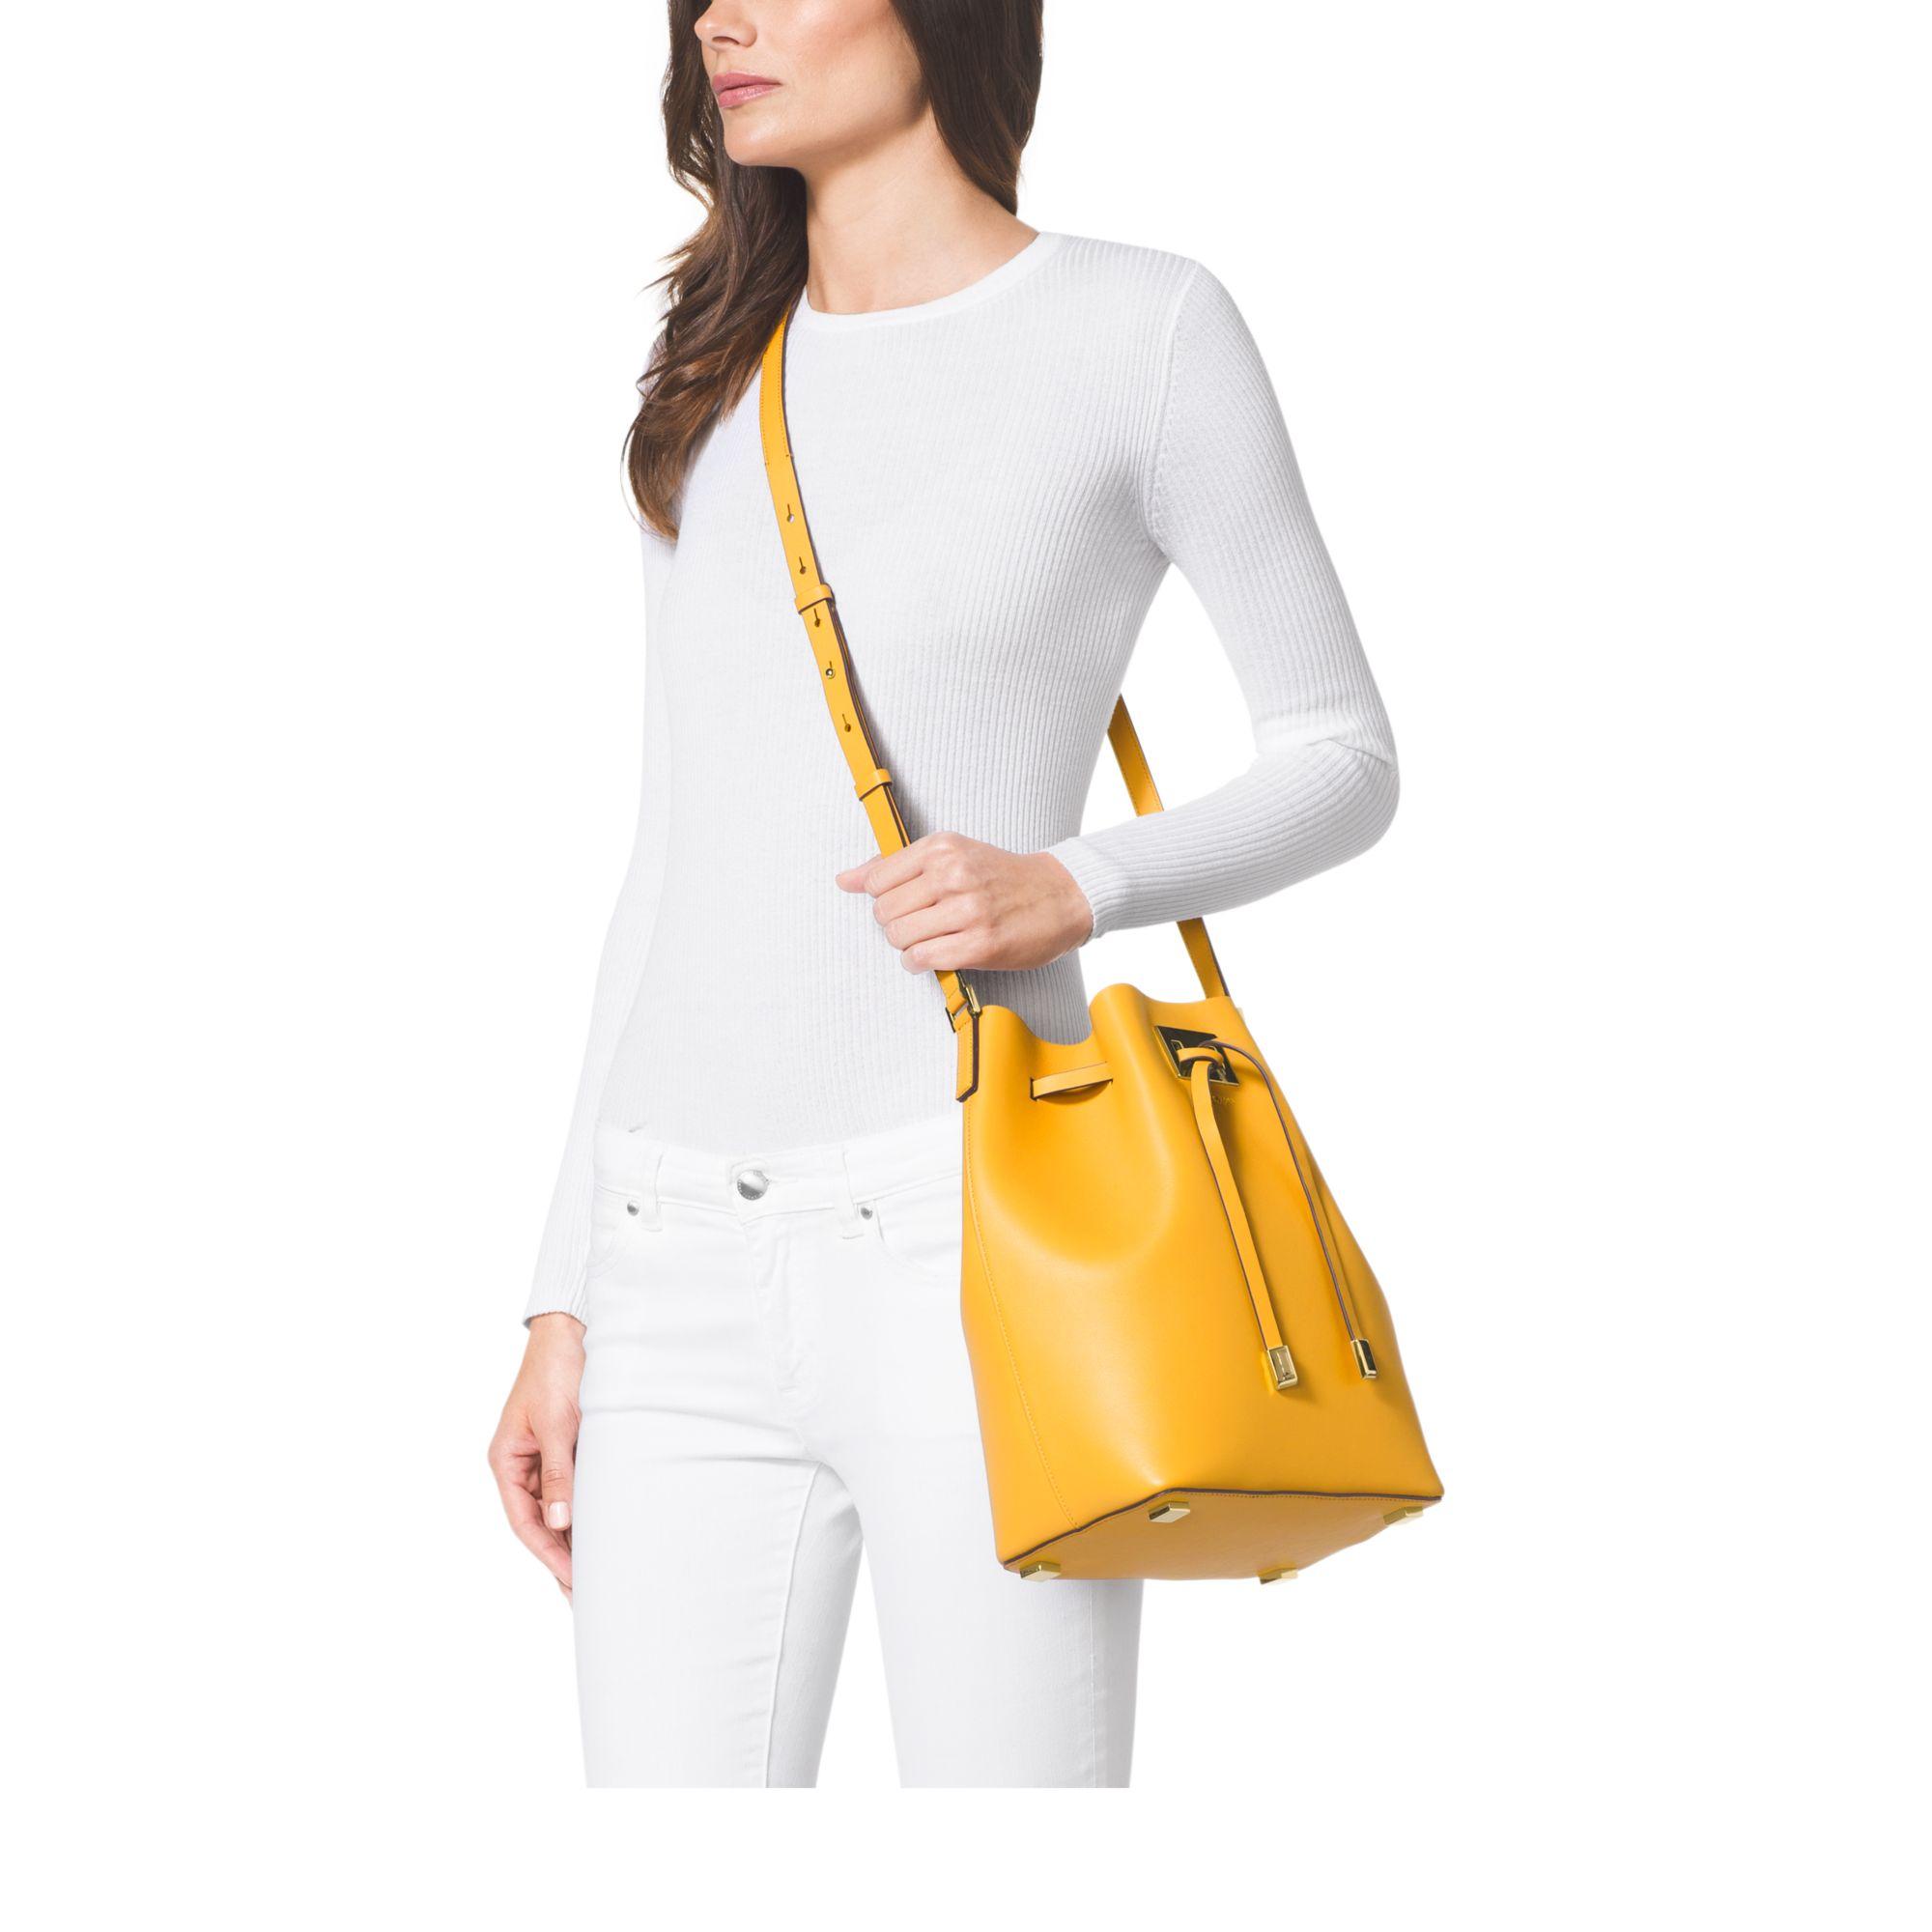 8e6b644cff27 Lyst - Michael Kors Miranda Large Leather Bucket Bag in Yellow